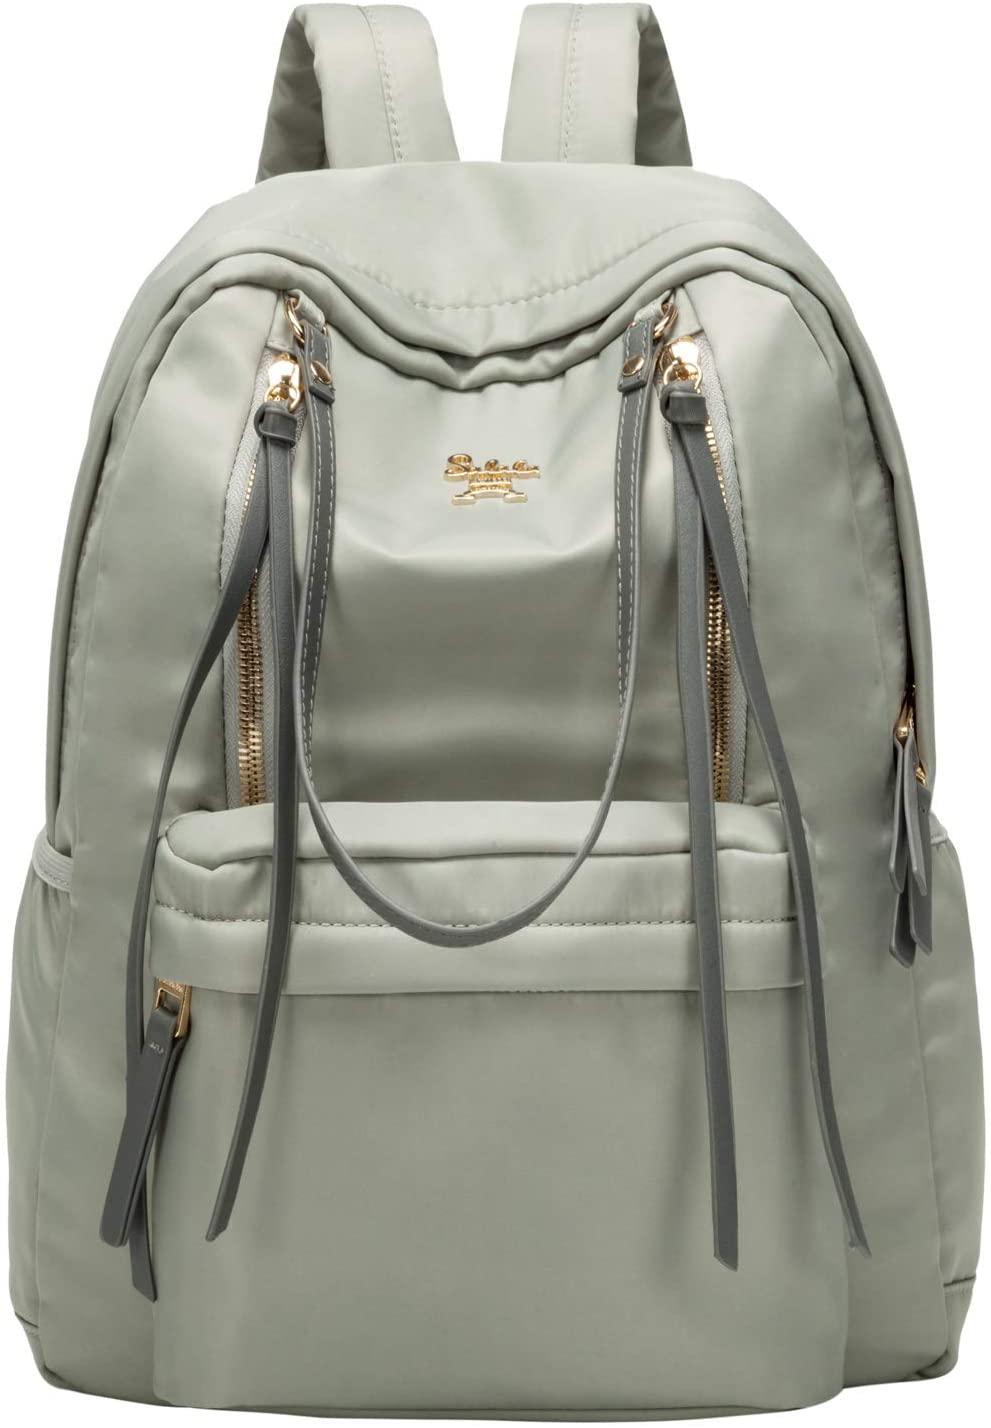 willikva Backpack for Women Travel Latop Backpack Waterproof School College Backpack Business Ladies 15.6 Notebook Lightweight Shoulder Bag (Grey)